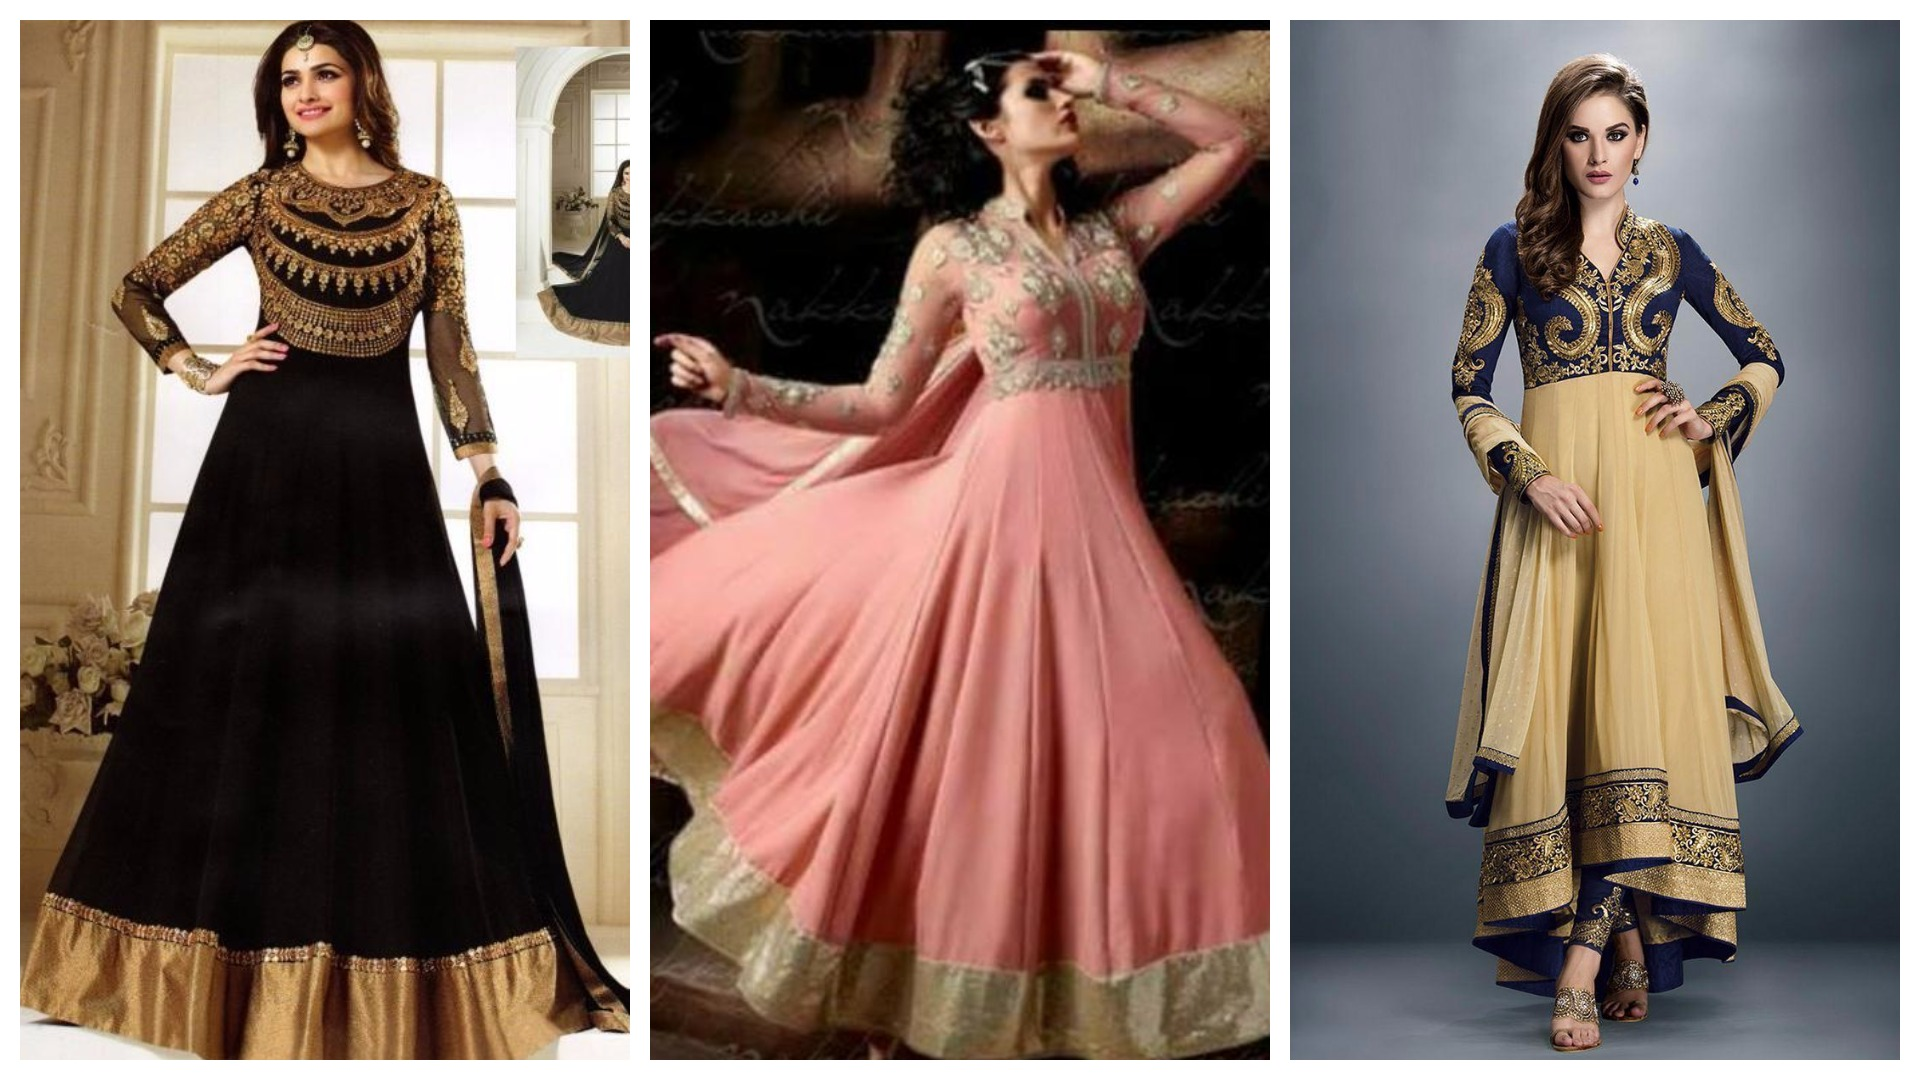 45d85160d تسوق و شراء ملابس و فساتين هندية للبيع اون لاين – Arab Fashion